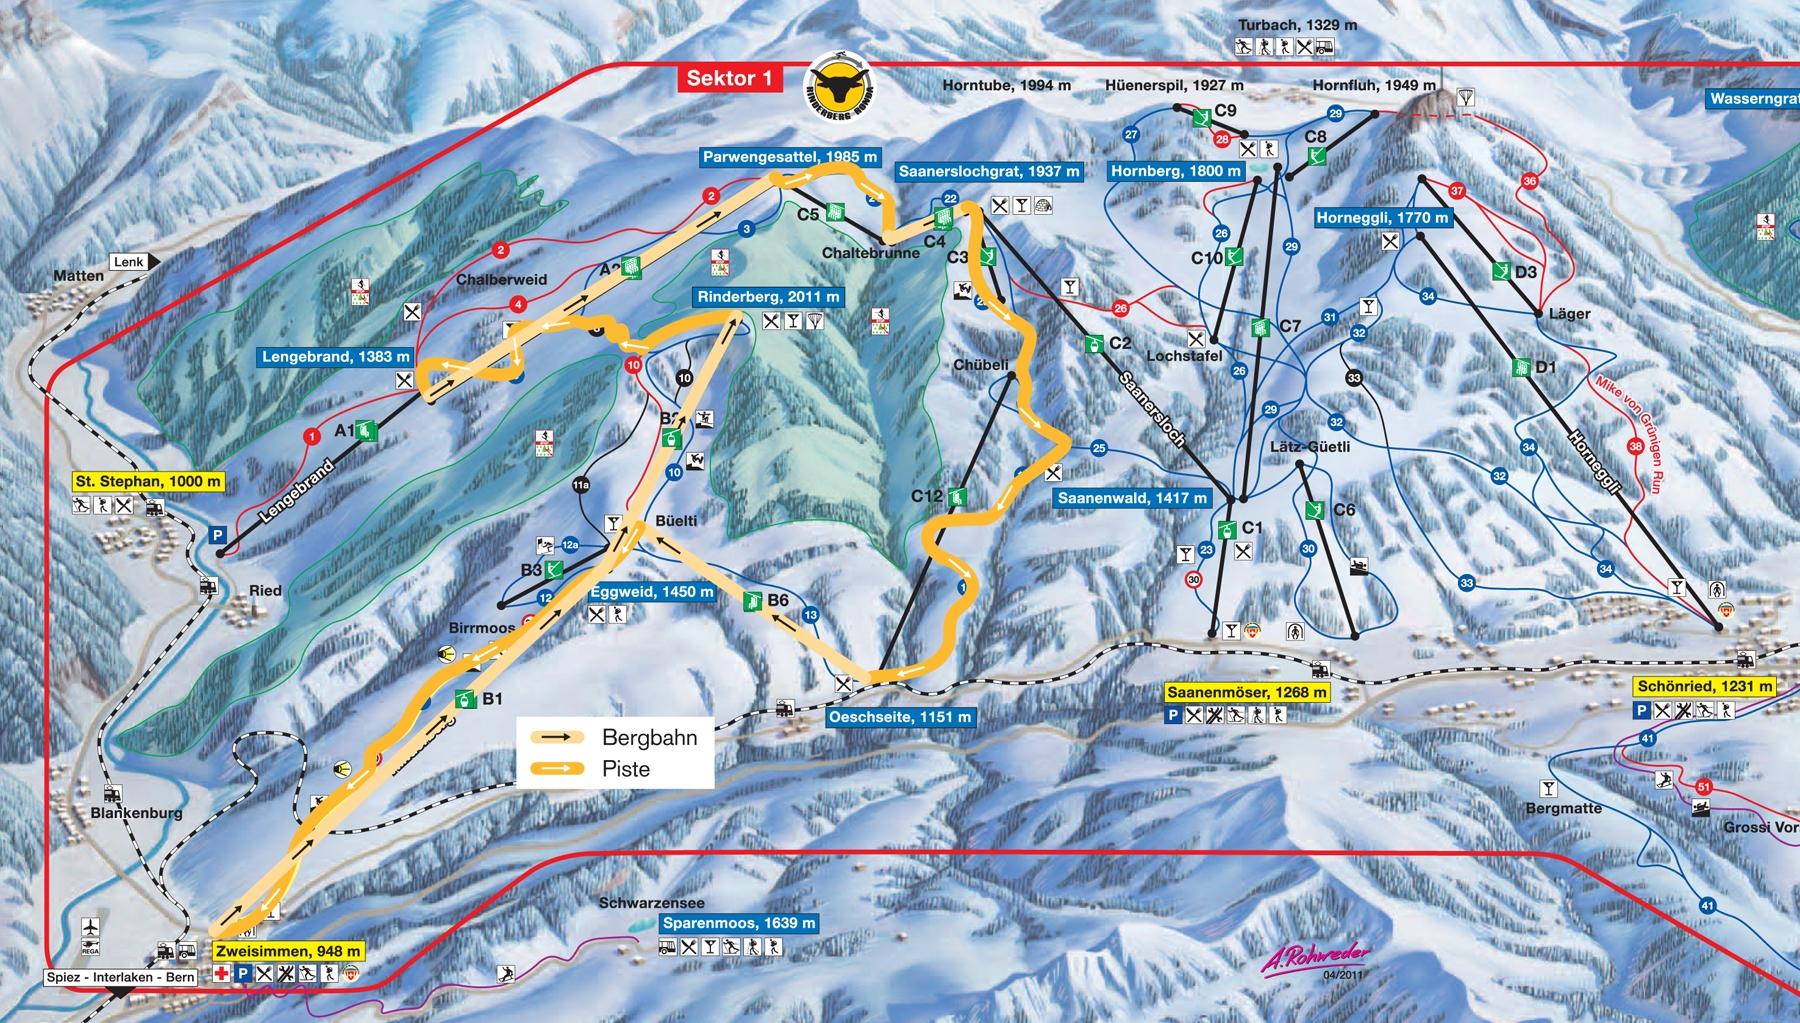 gstaad/rinderberg-saanerslochgrat piste map / trail map